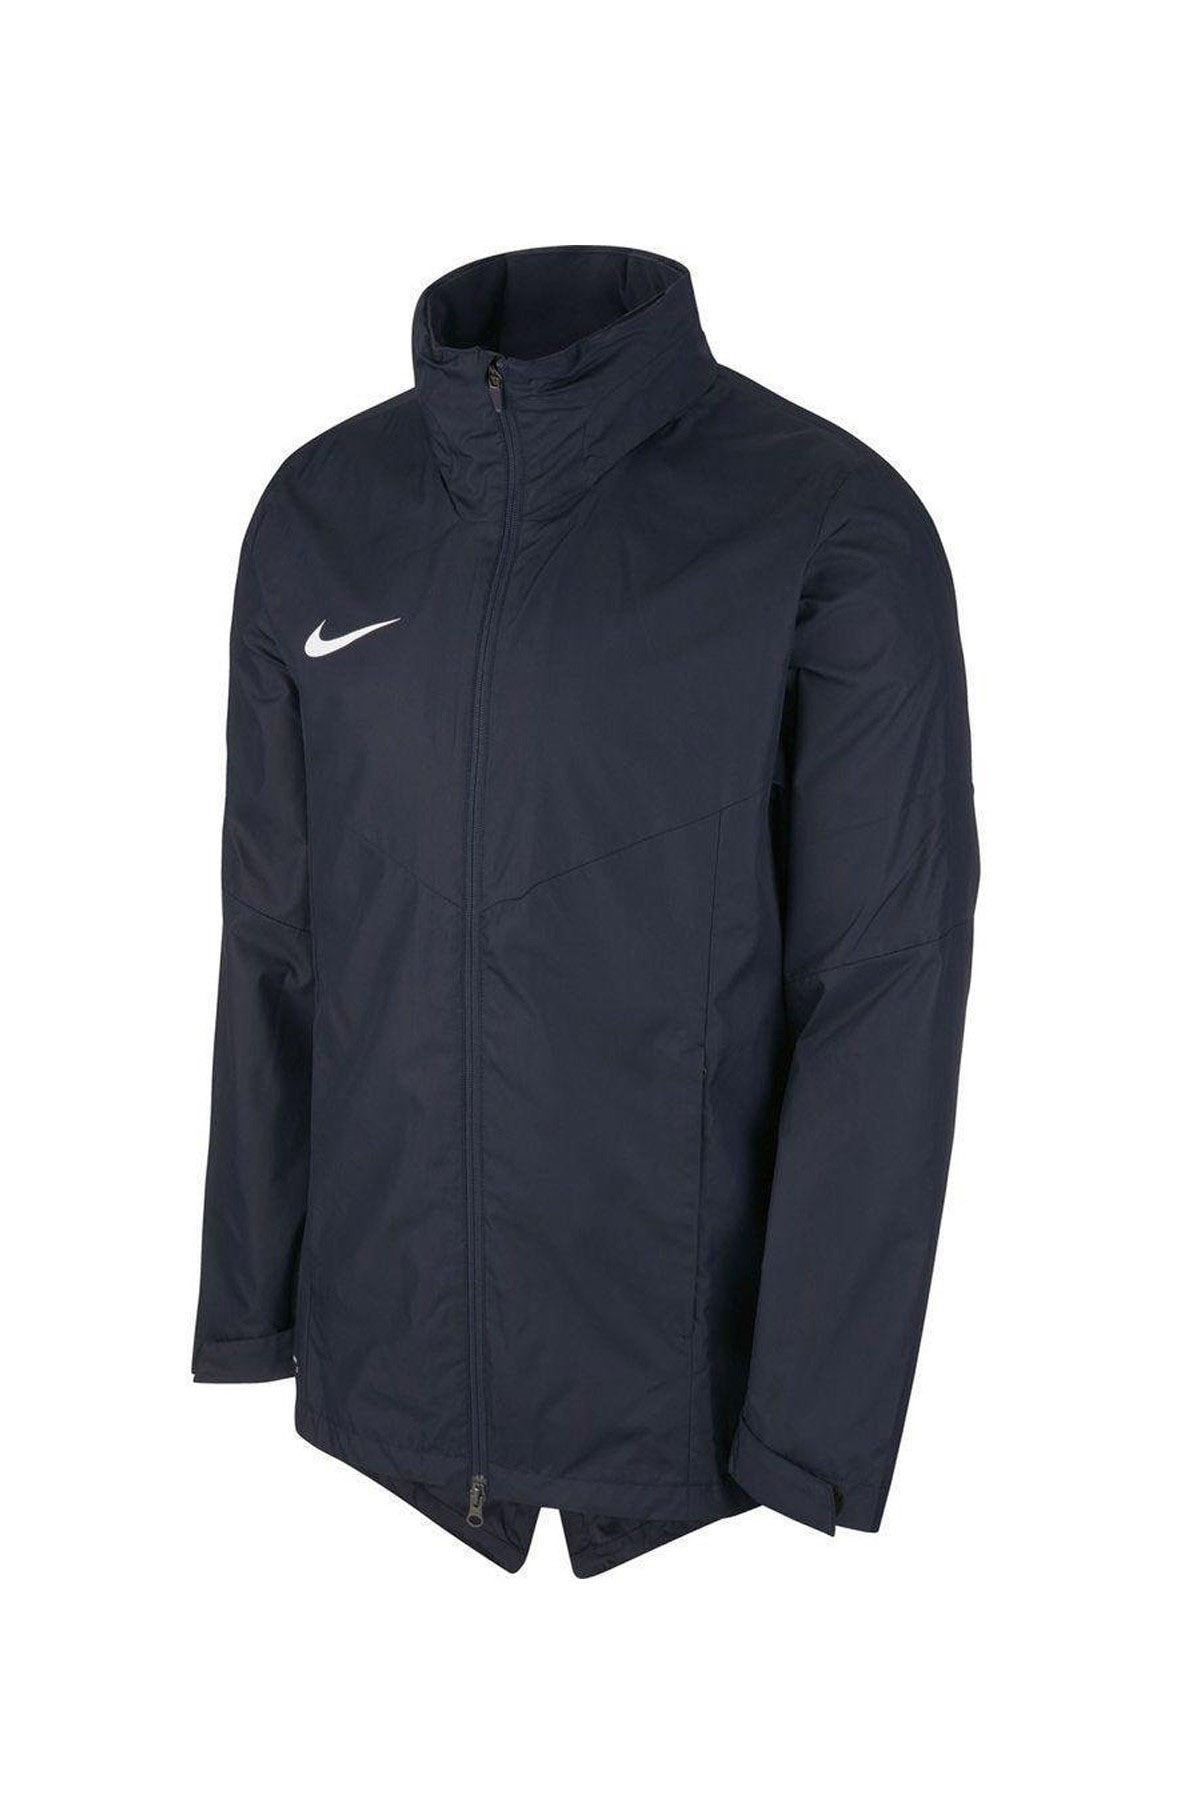 Nike Çocuk Yağmurluk&Rüzgarlık - RPL ACDMY 18 RN JKT - 893819-451